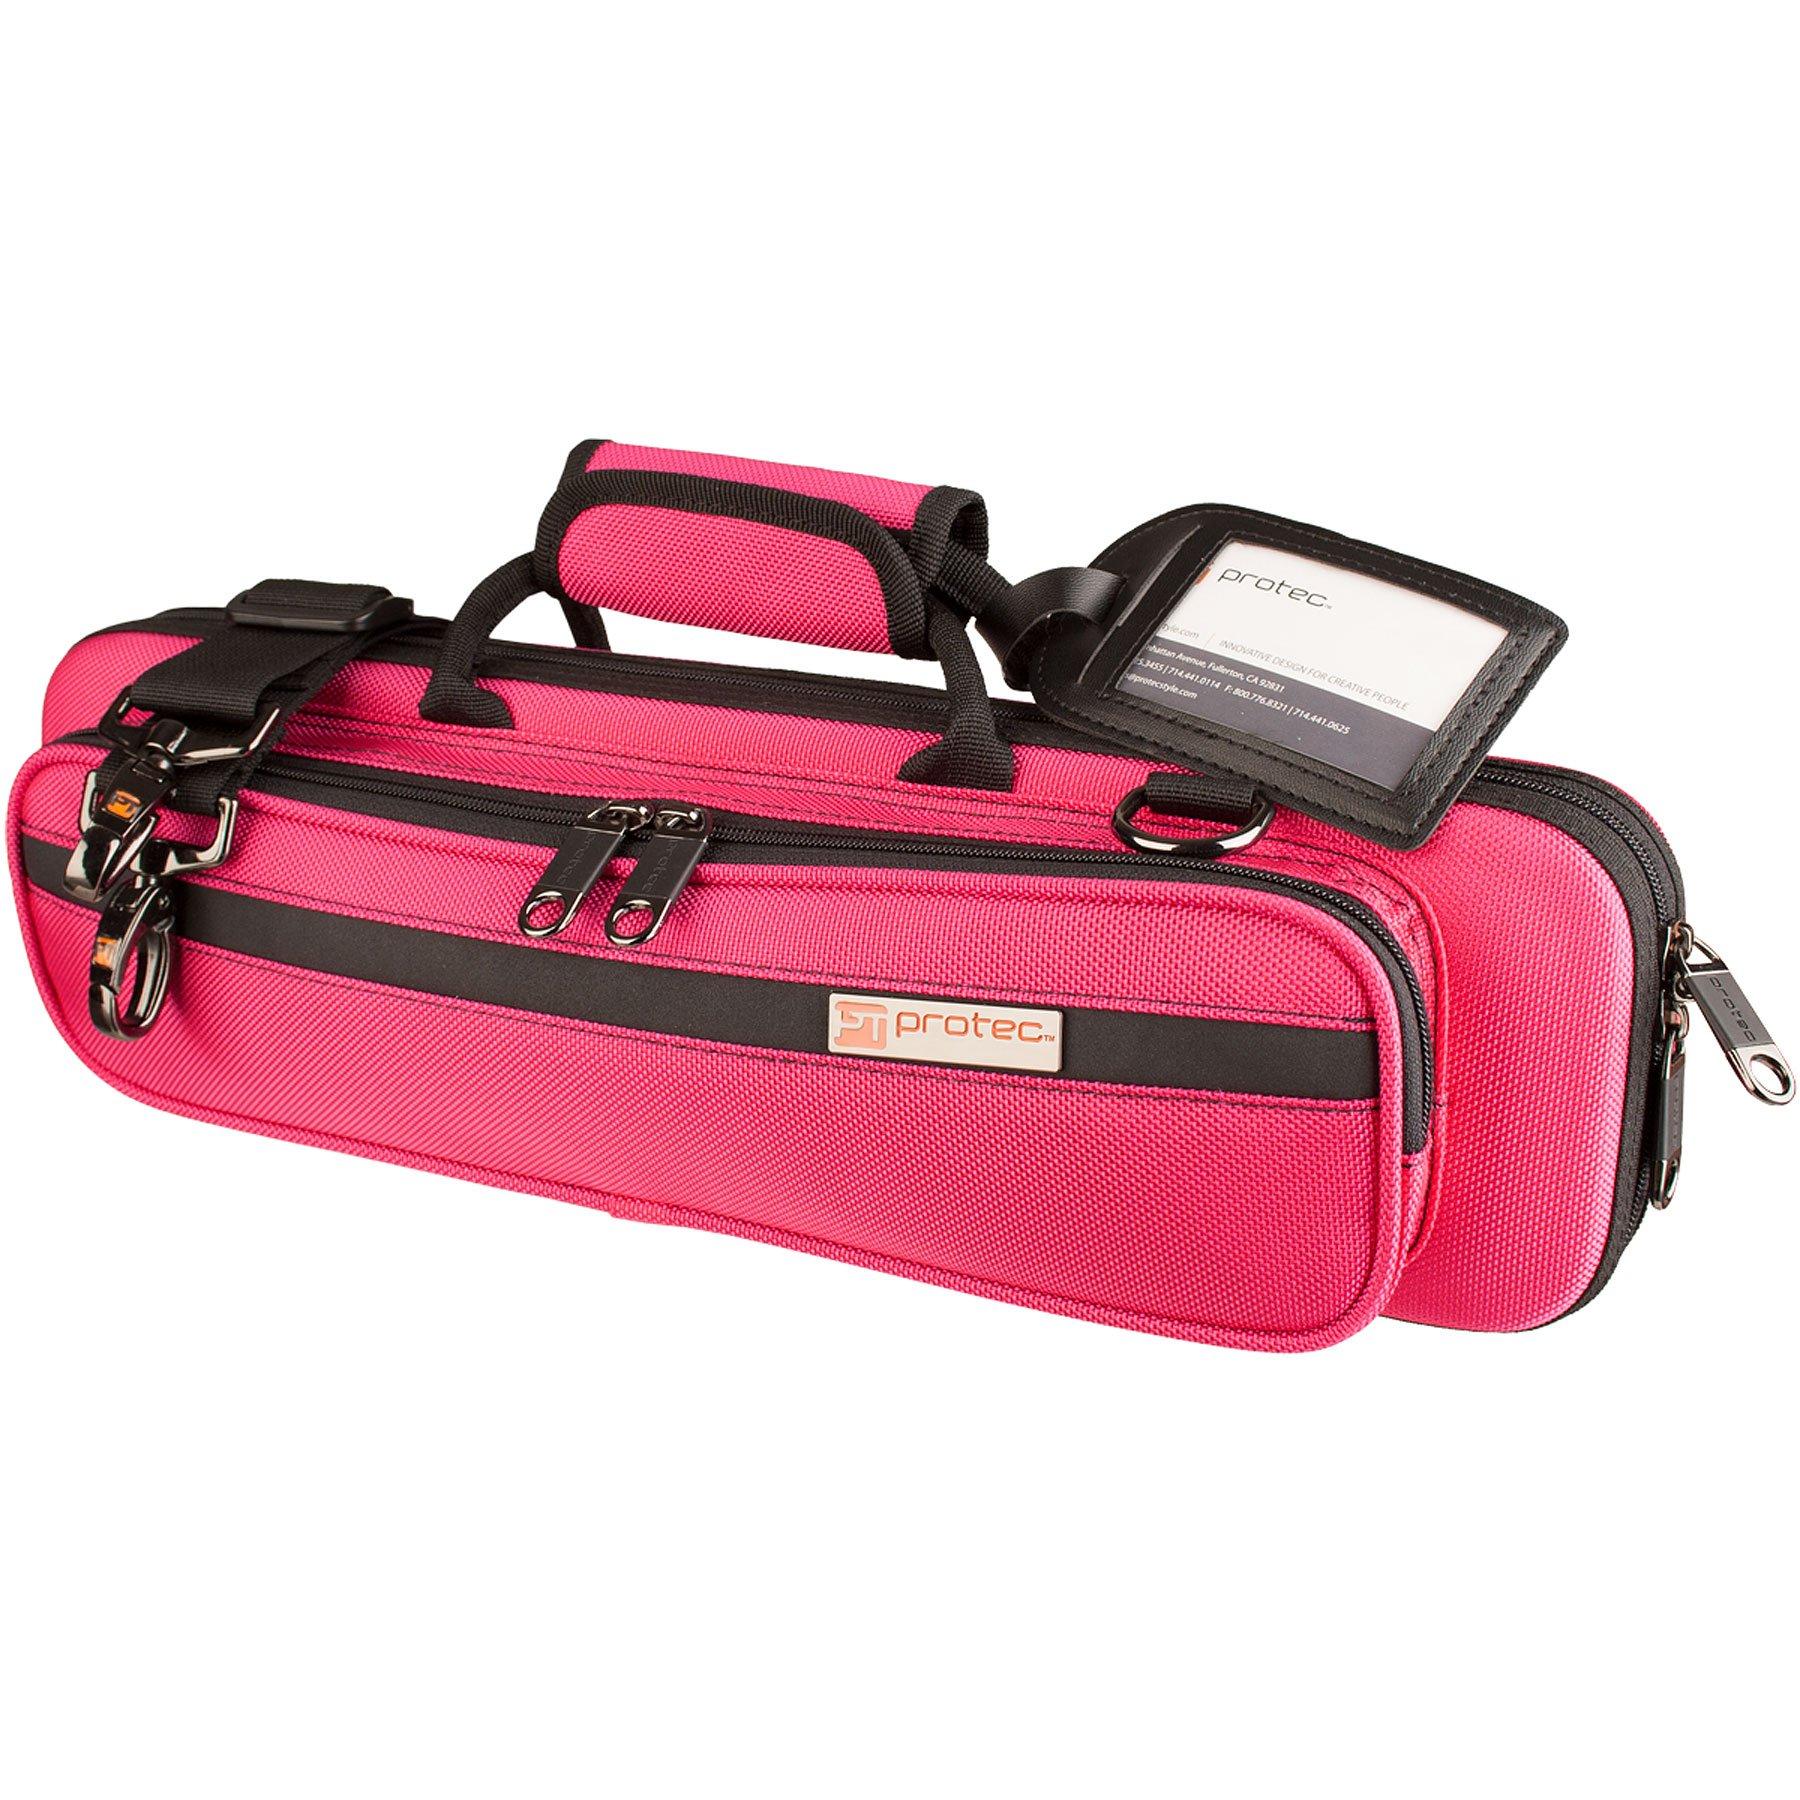 Protec PB308HP  Flute Slimline PRO PAC Case,  Pink